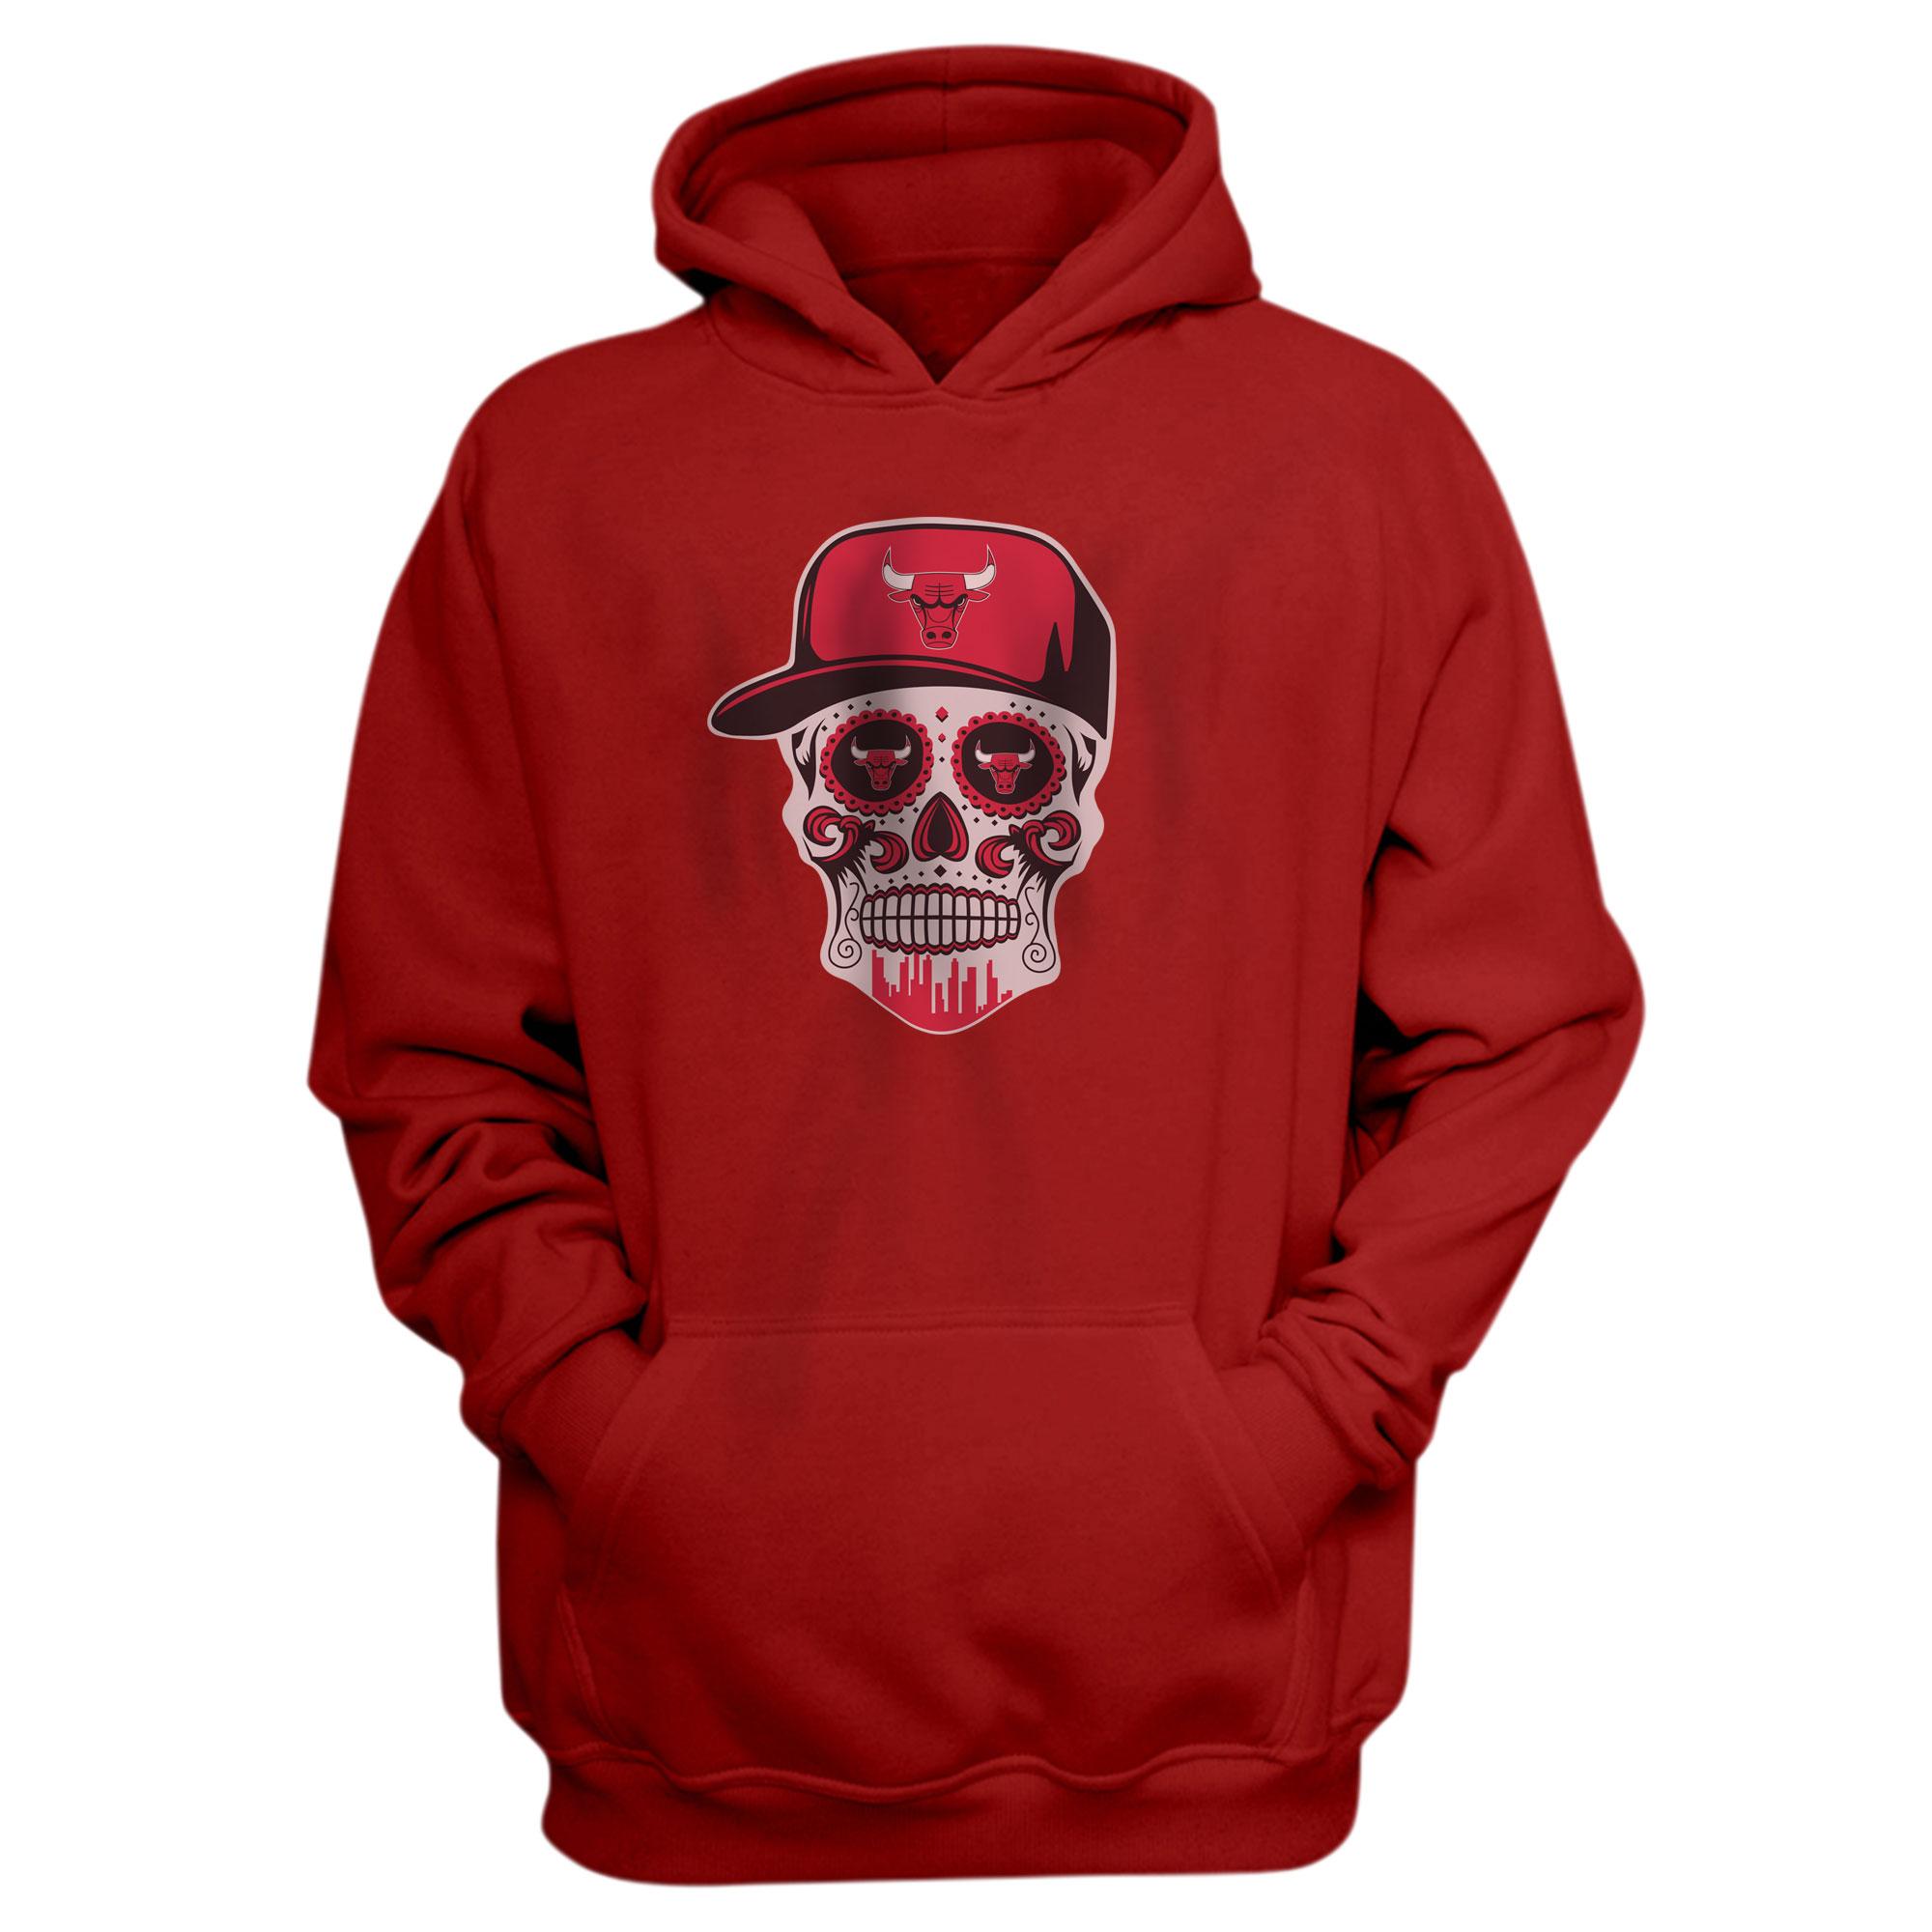 Bulls Skull Hoodie (HD-RED-NP-447-NBA-BULLS-SKULL)